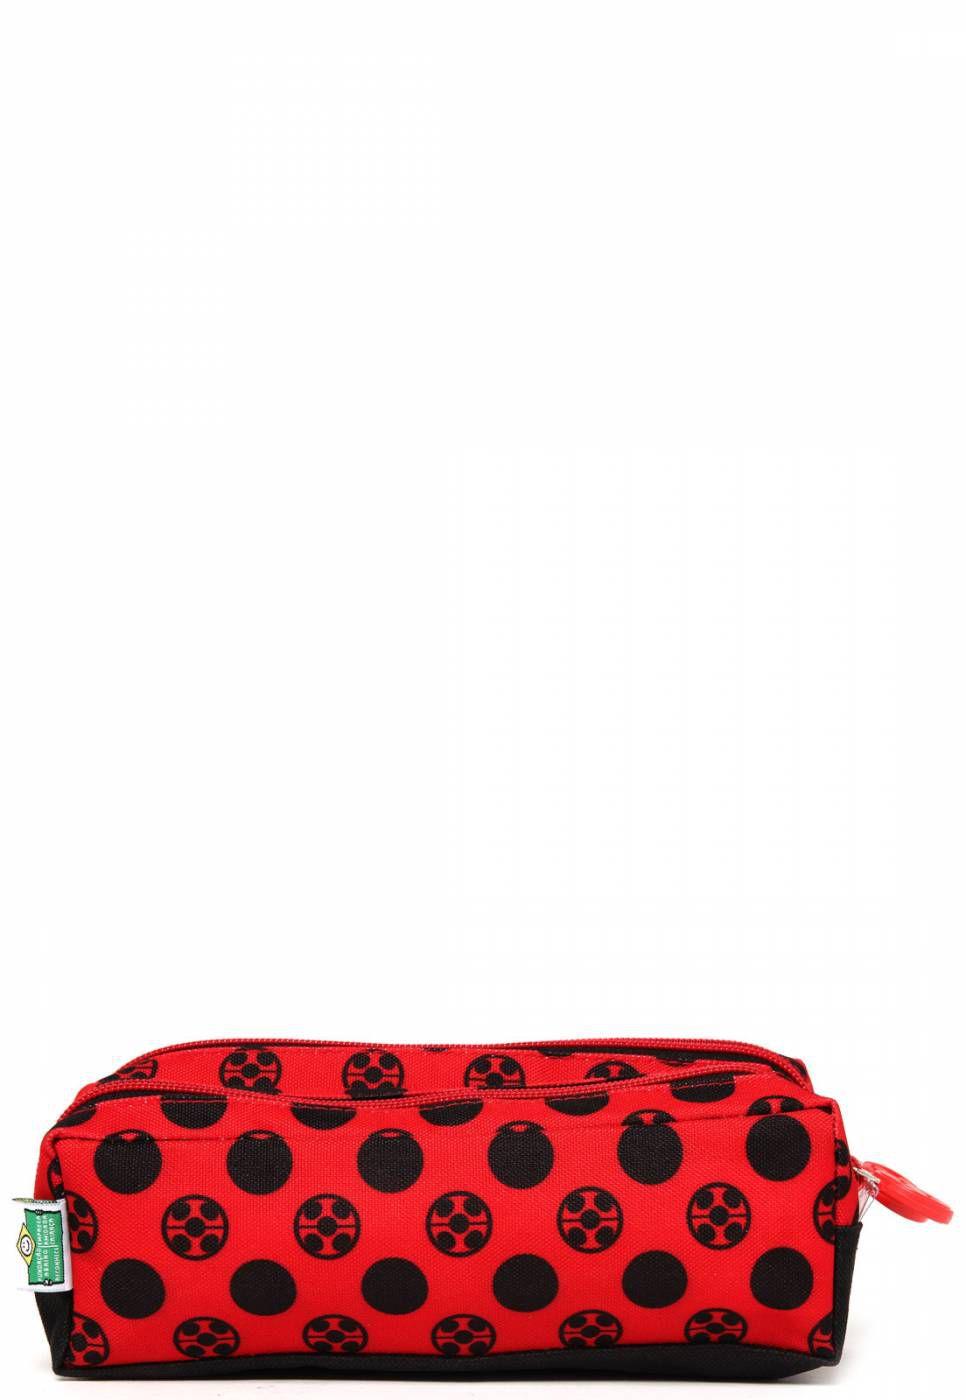 Estojo Duplo Pacific Miraculous Ladybug 966E17